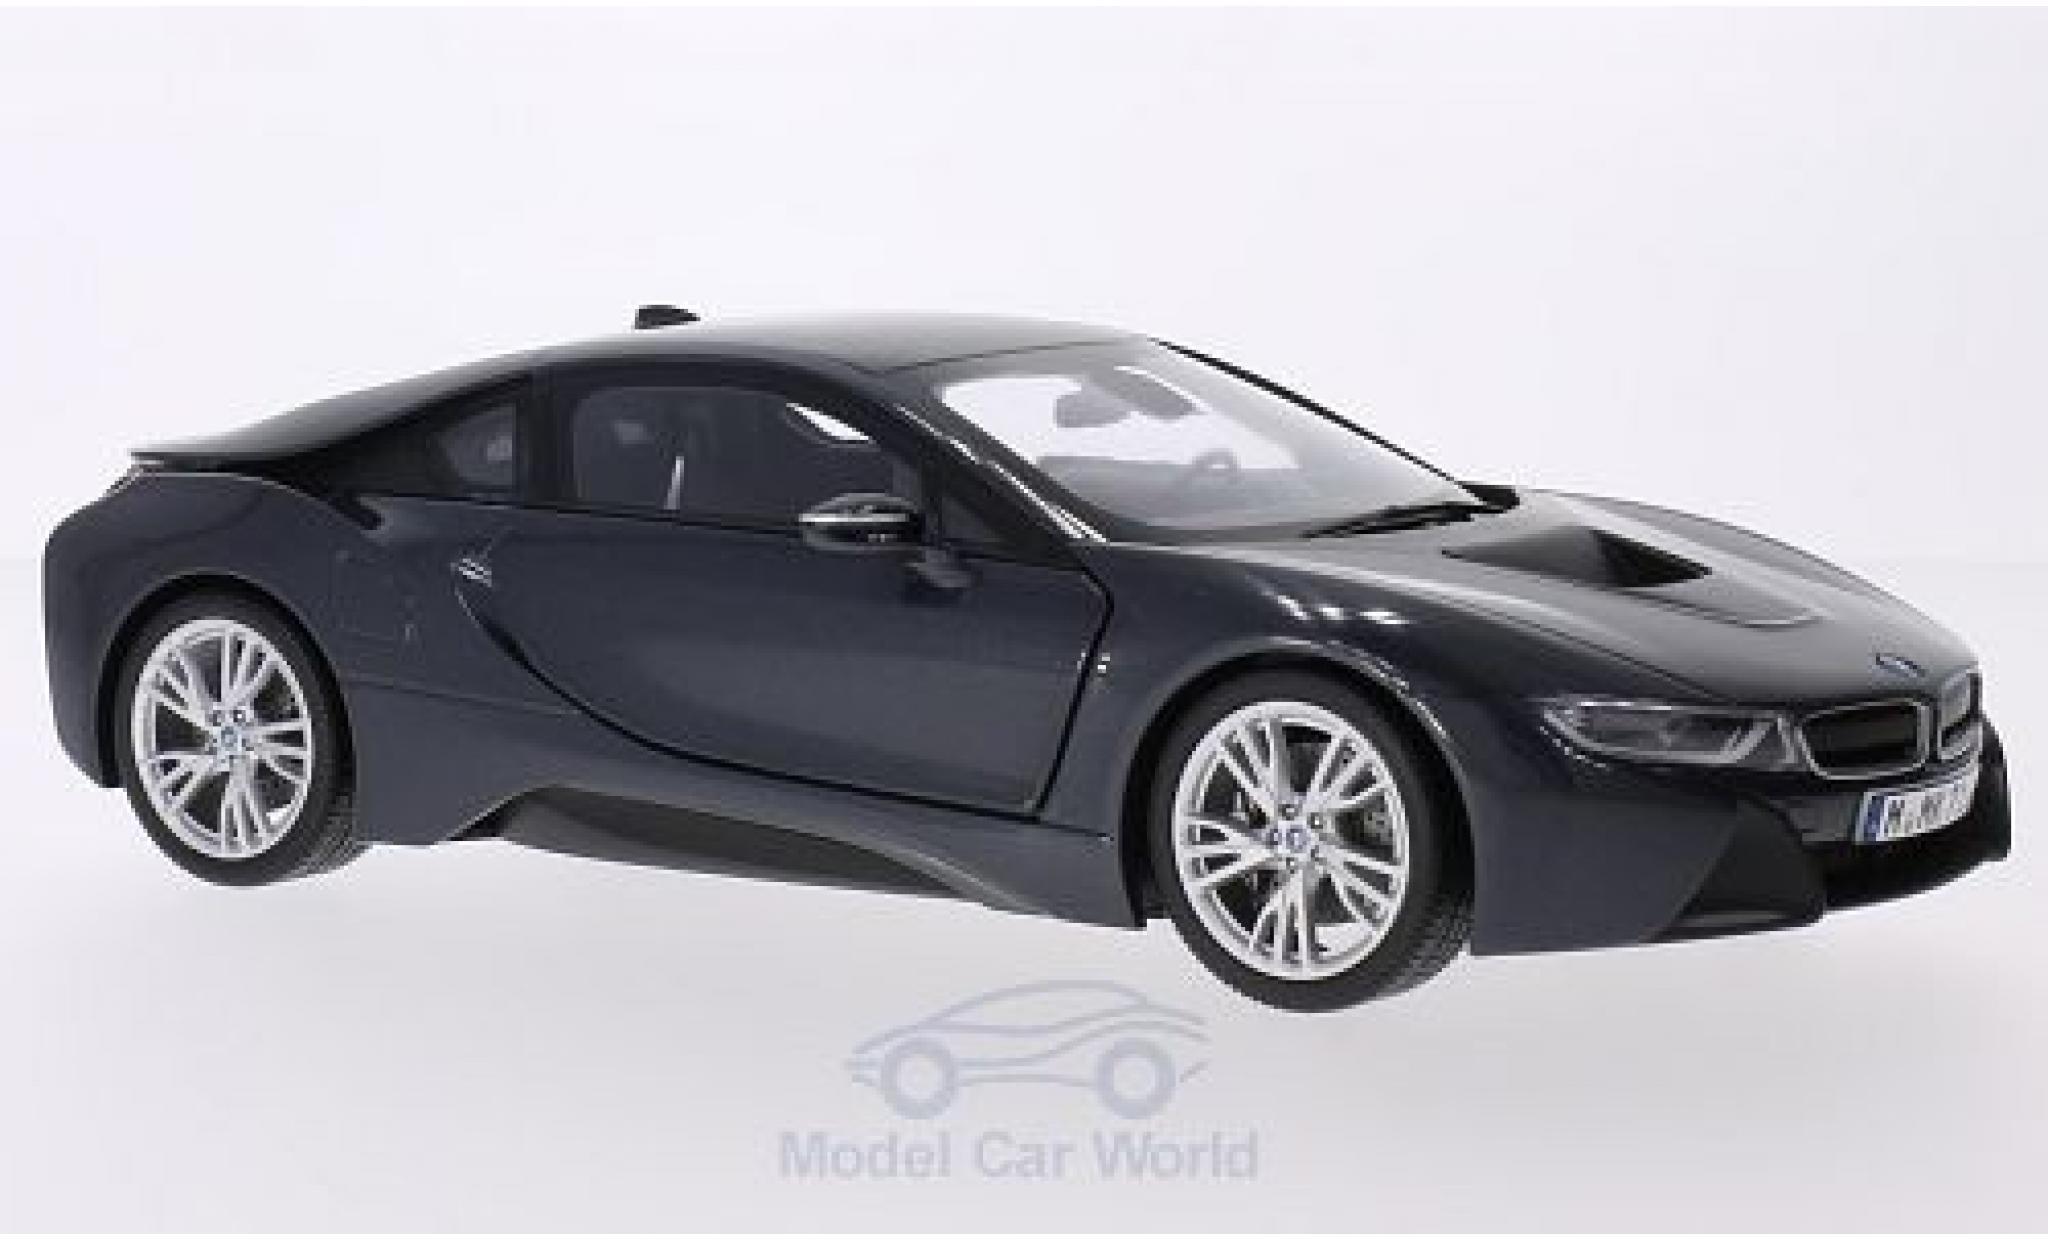 Bmw i8 1/18 Paragon BMW metallic-dunkelgrise